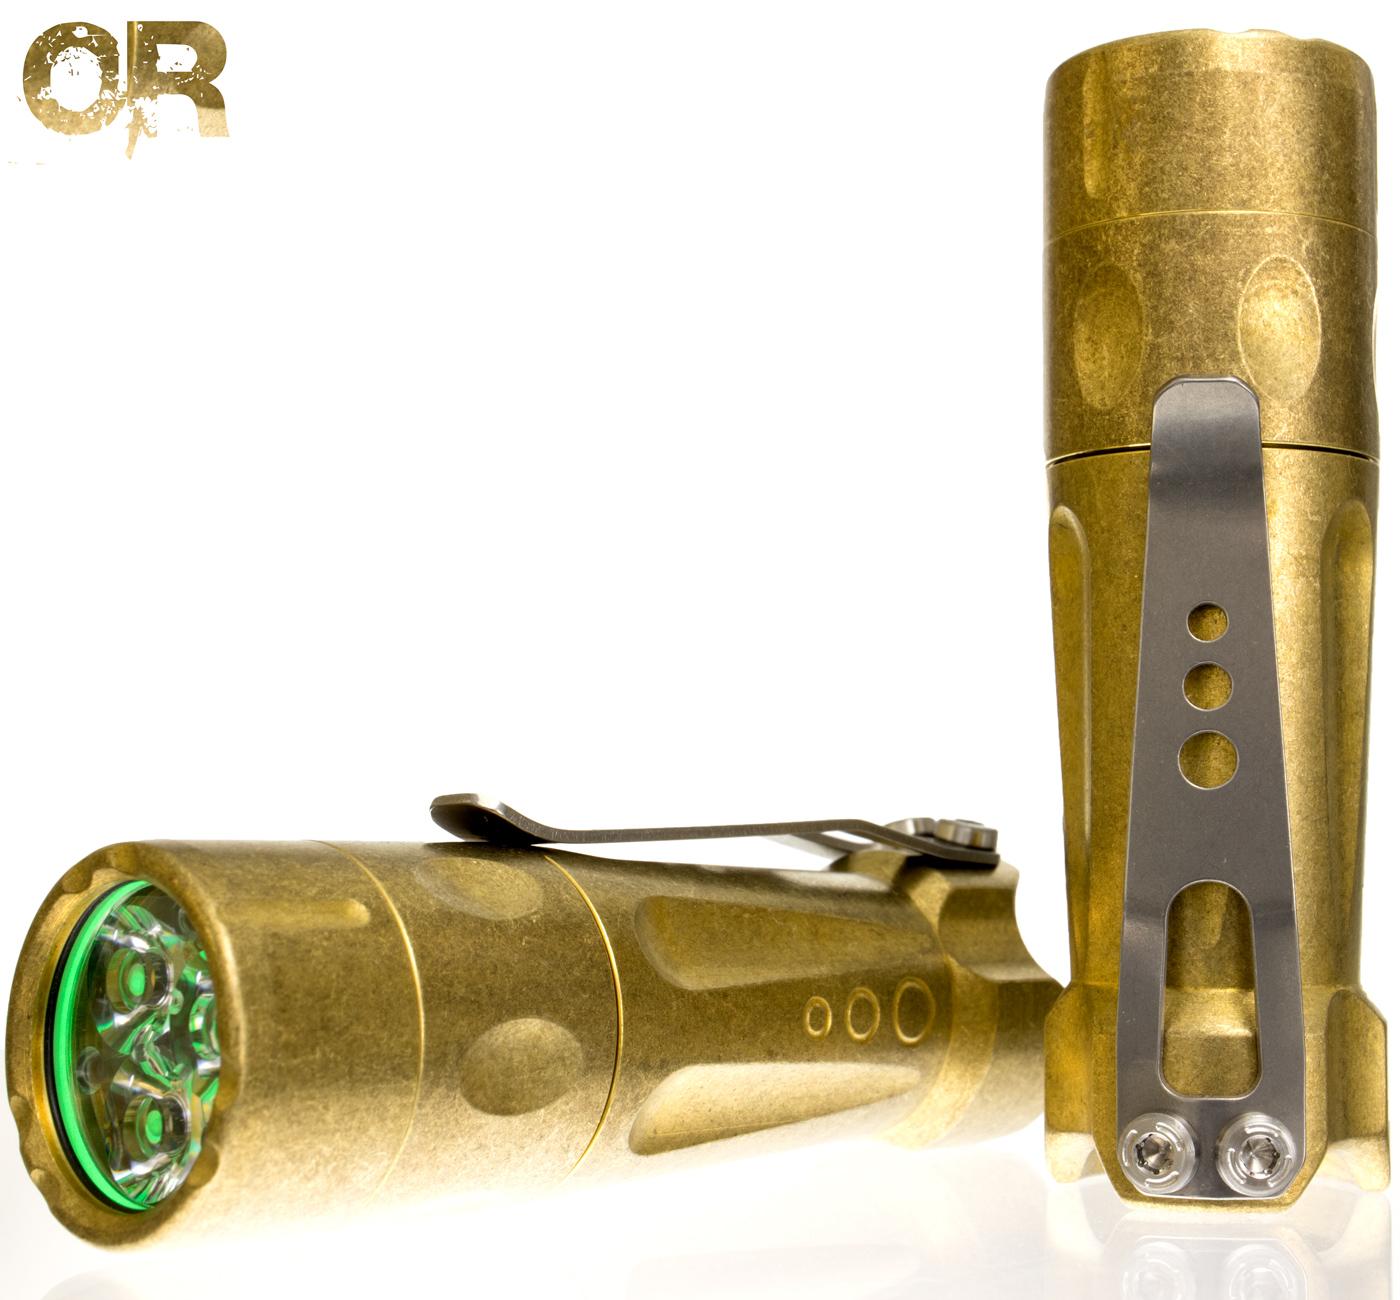 Insider #64 BOSS Brass Clicky, Copper Clicky, Walking Wand